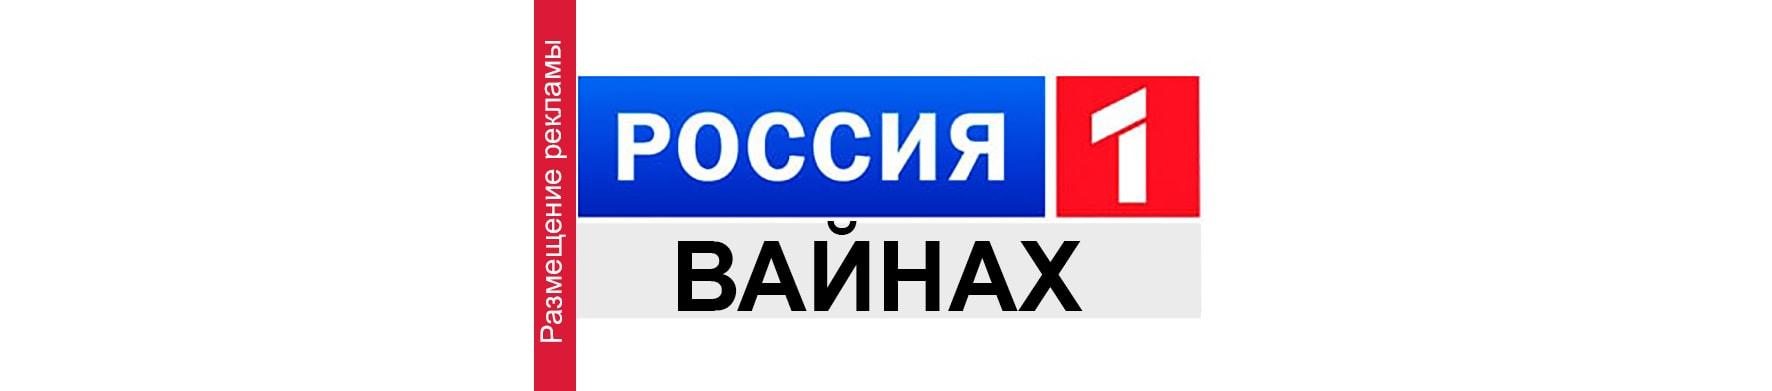 Реклама на телевидении в Чечне Россия 1 Вайнах